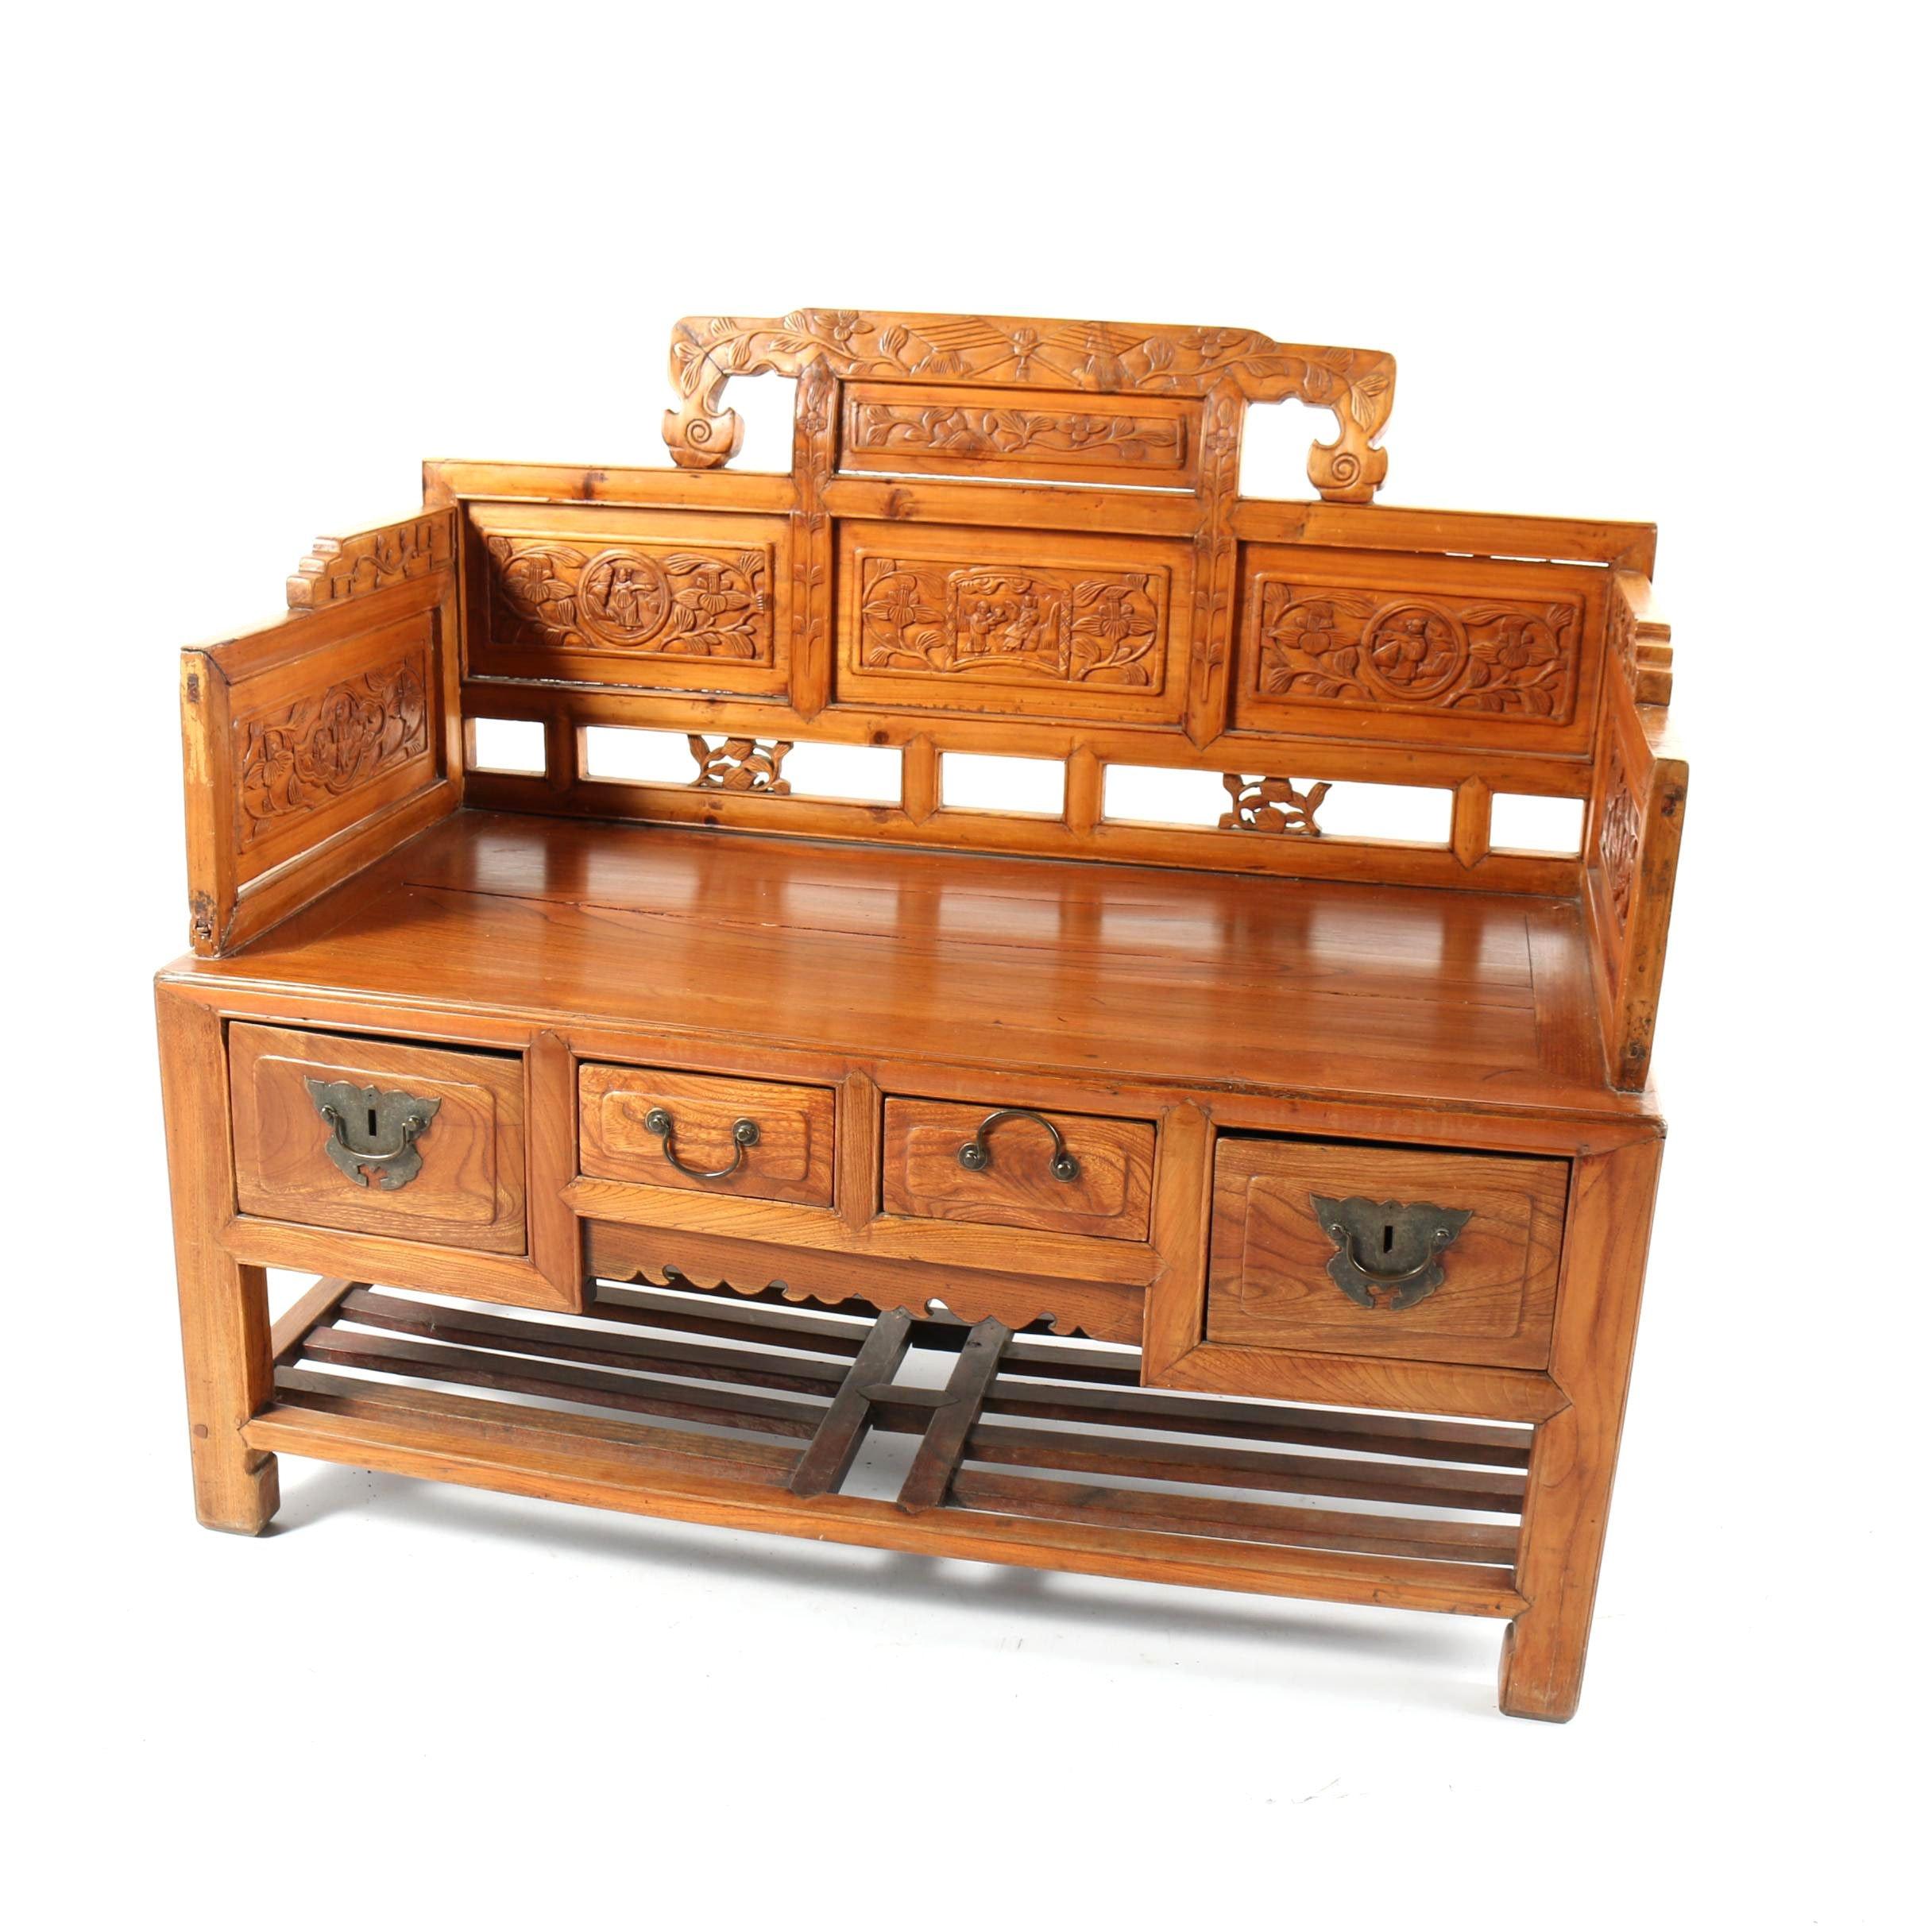 Vintage Korean Carved Wood Bench with Storage Drawers